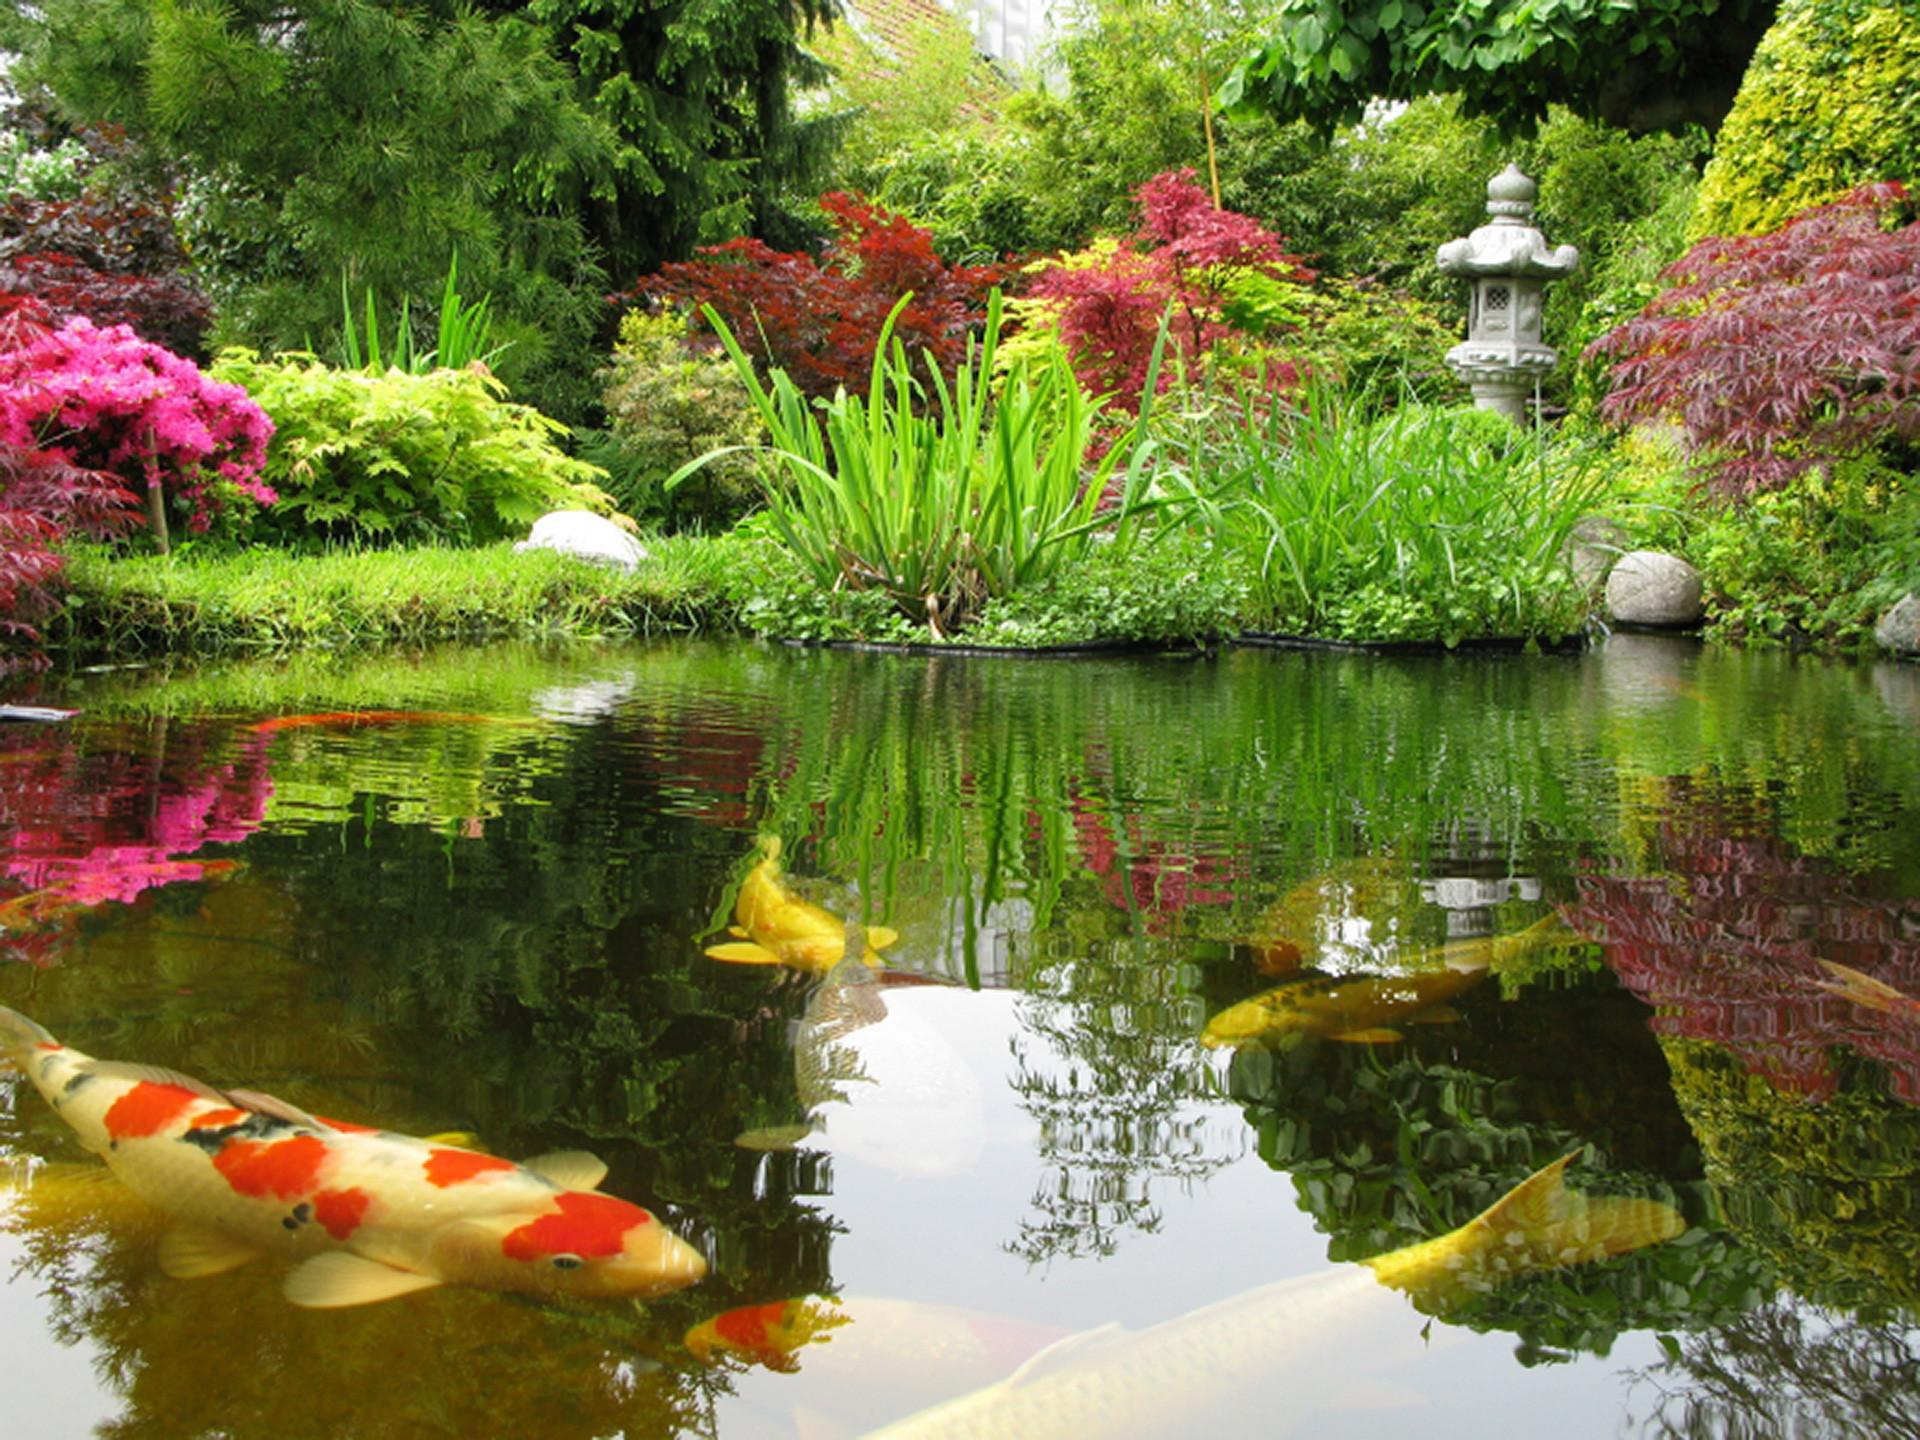 Residential Outdoor Koi Ponds – Long Island New York – Okeanos Aquascaping